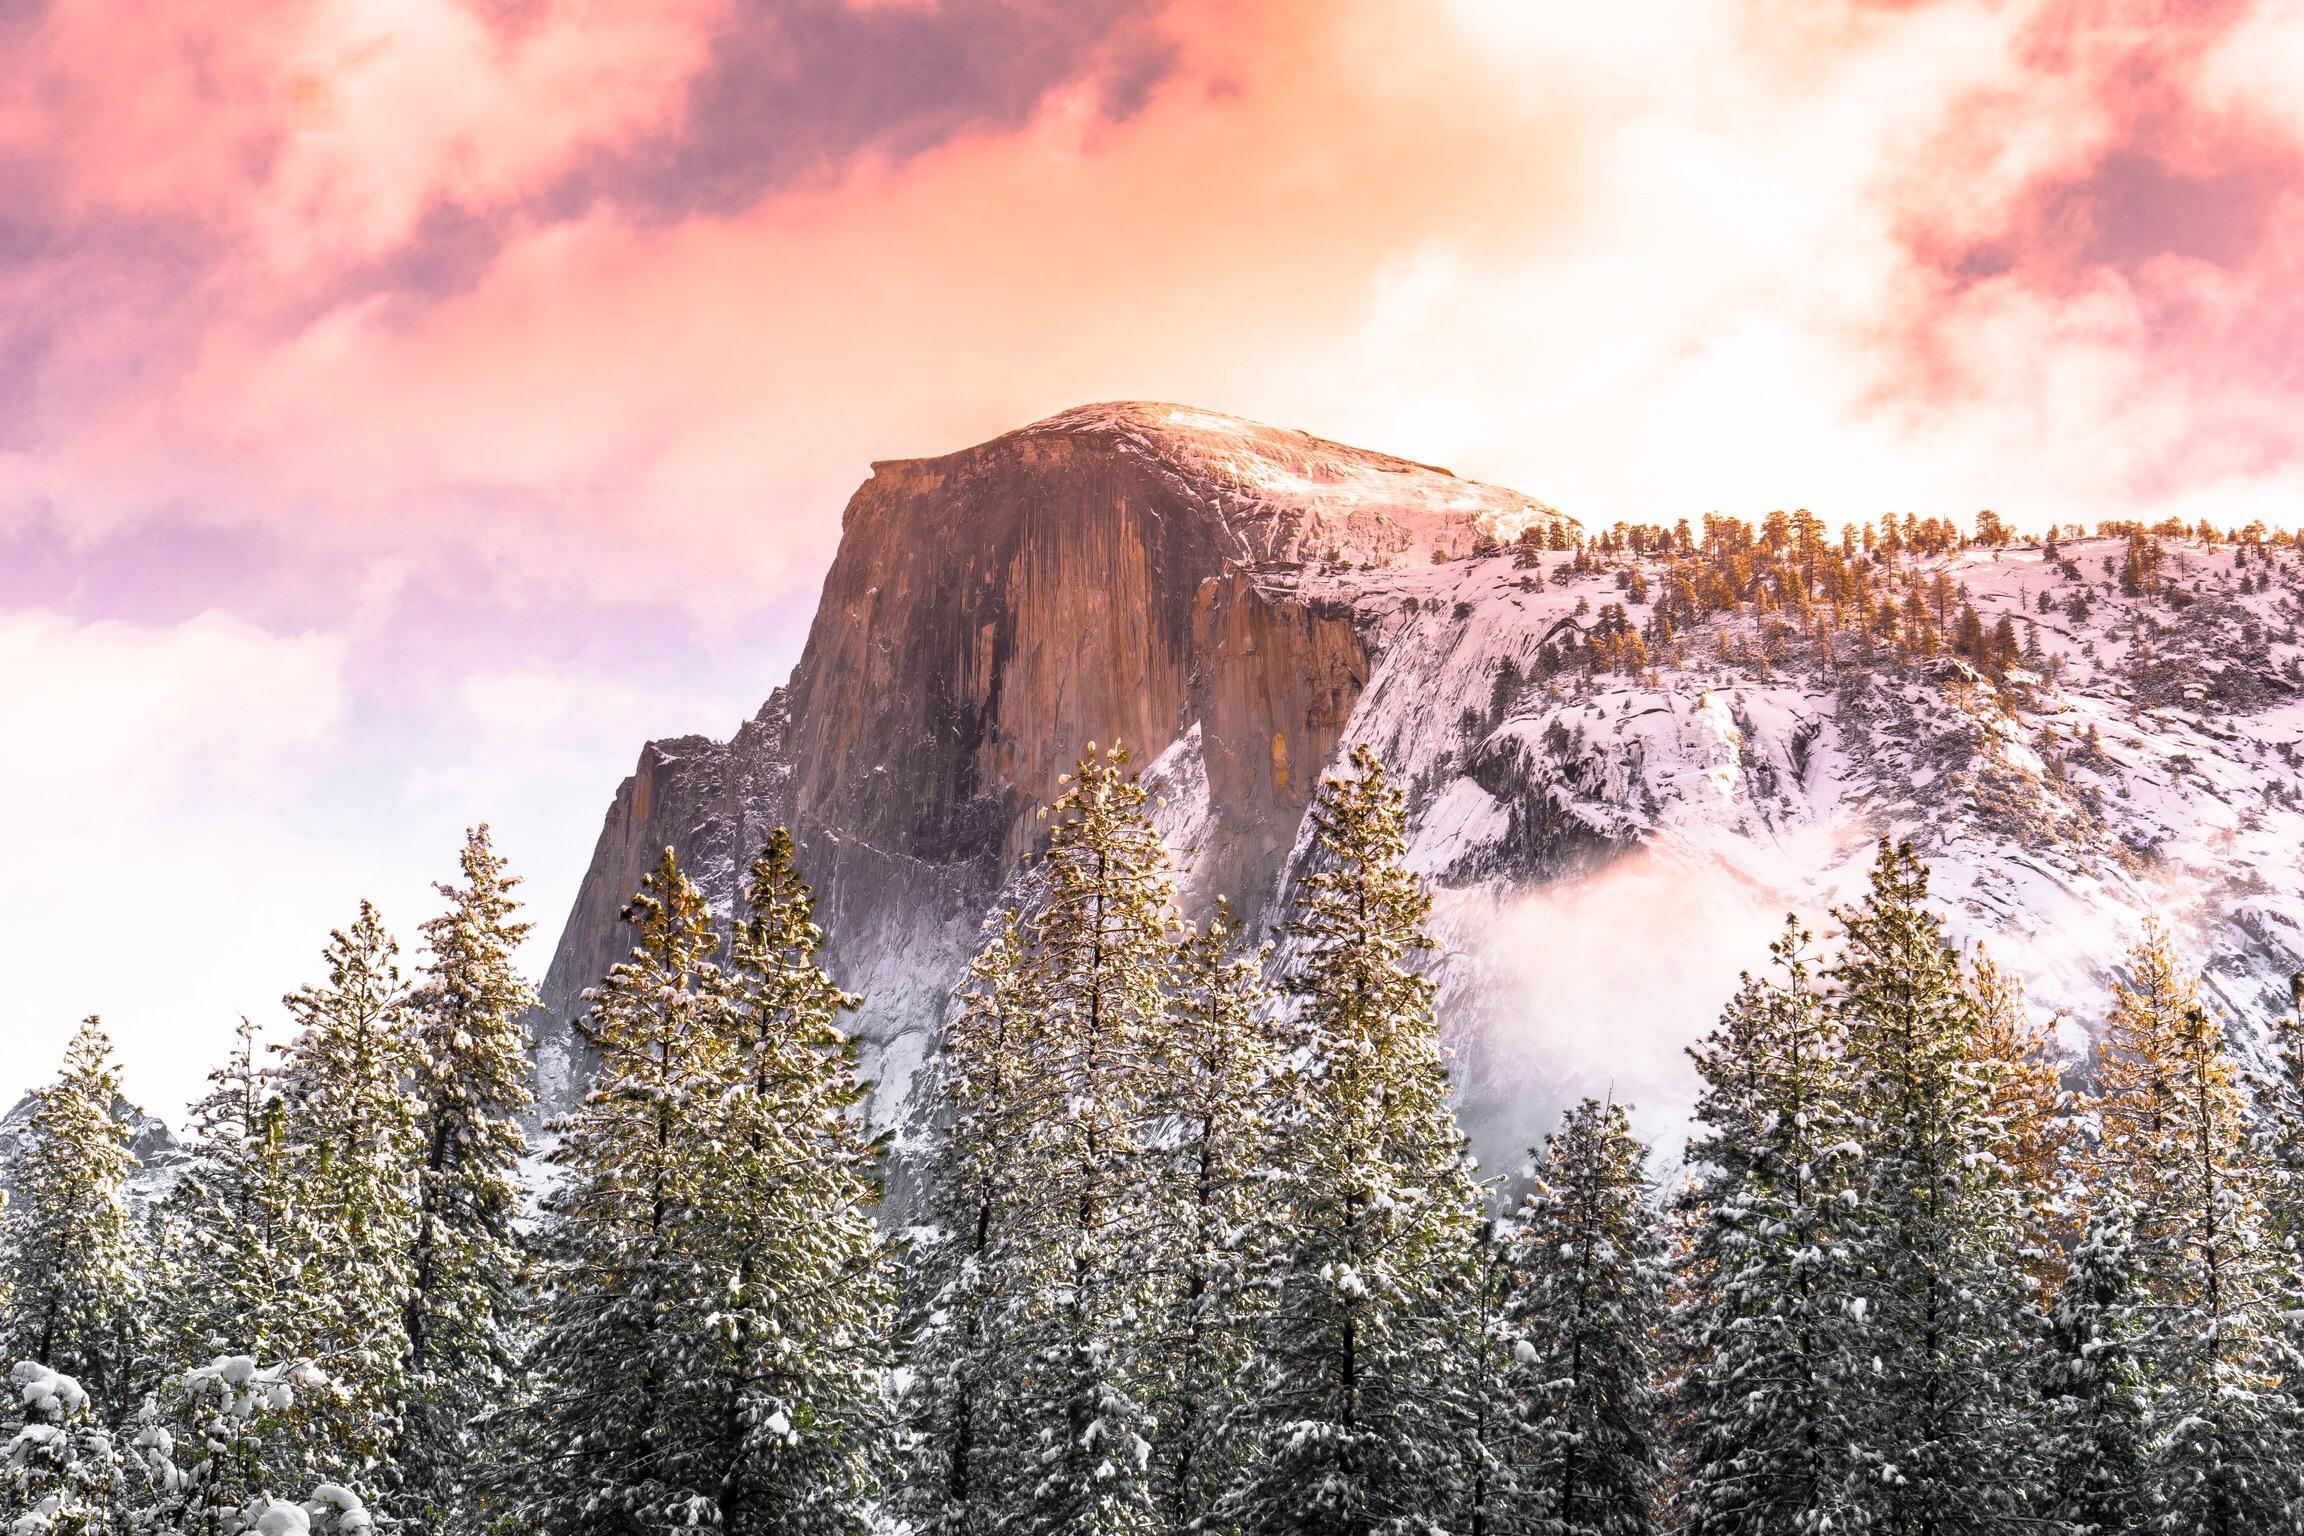 Reminded me of the Apple desktop wallpaper Half Dome Yosemite 2304x1536